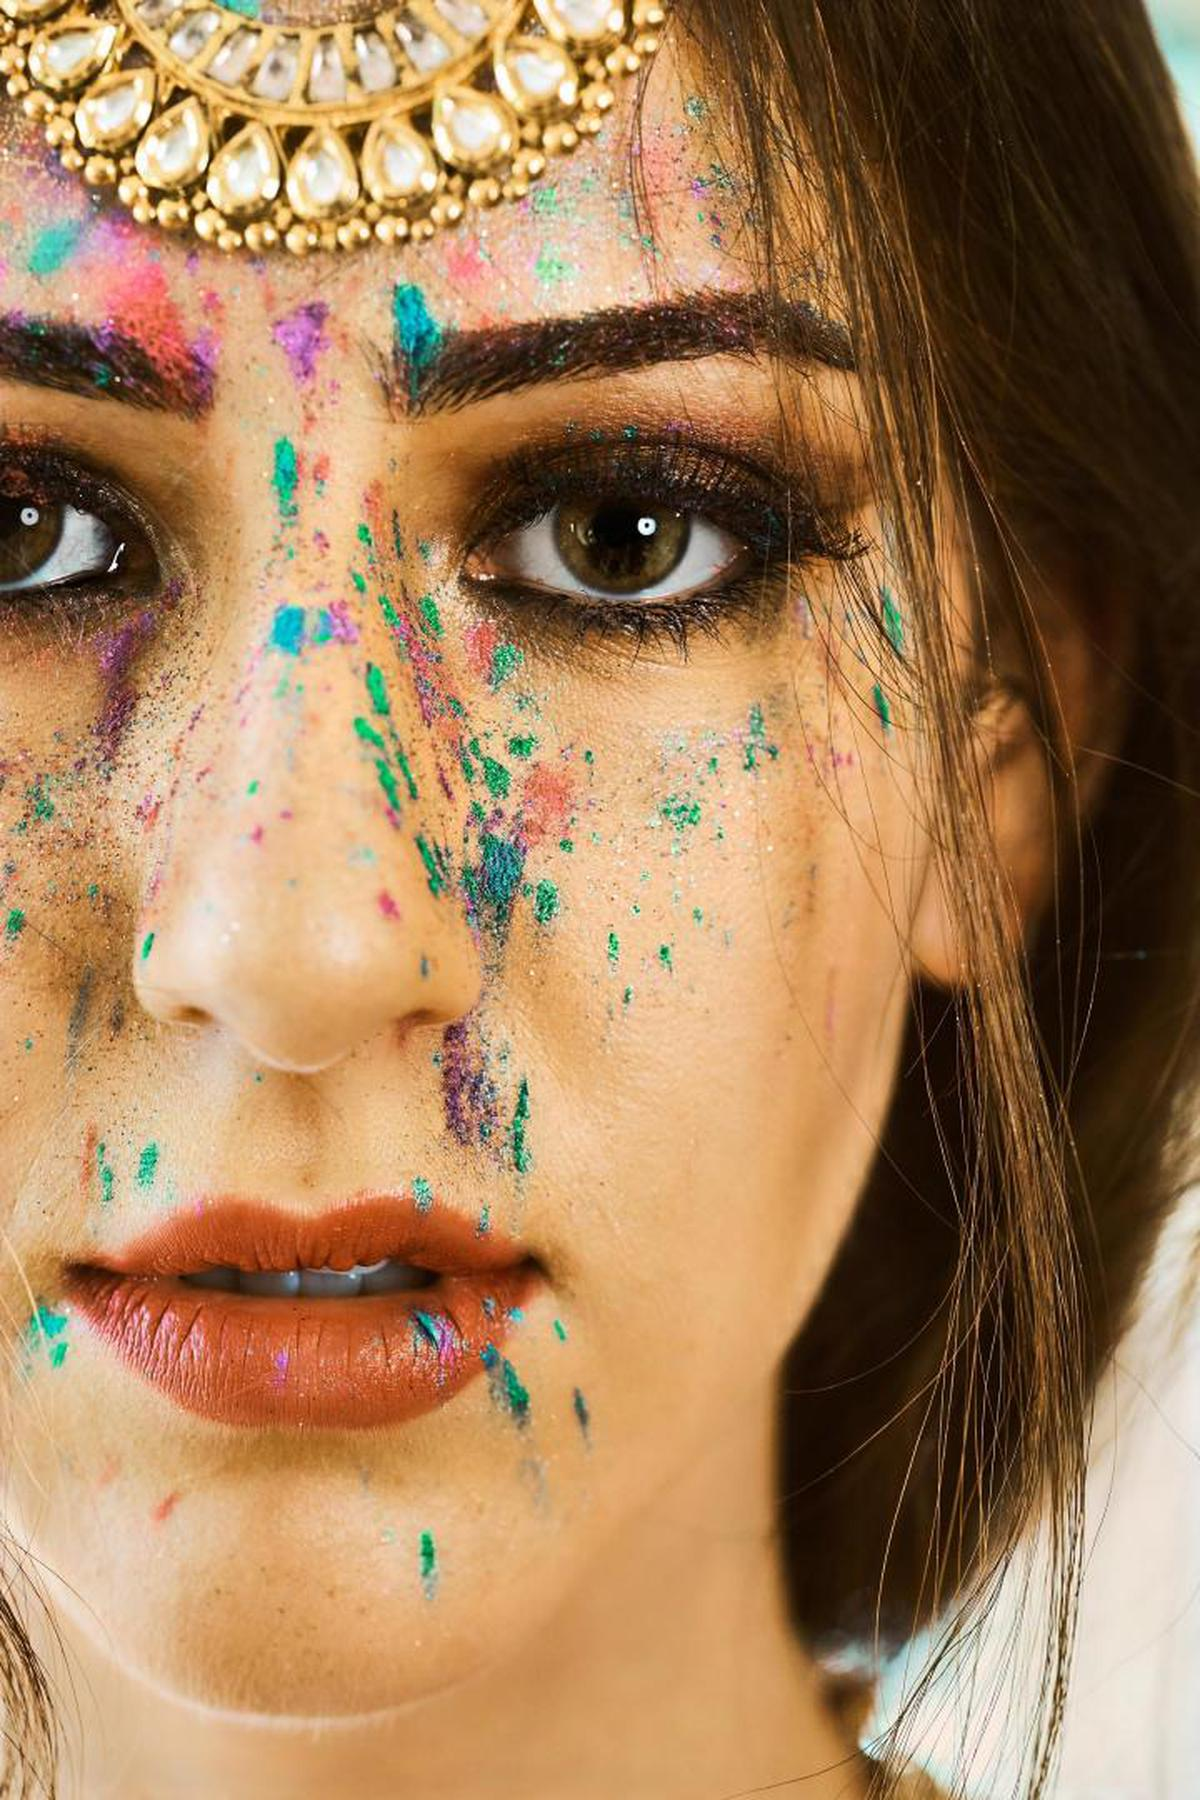 Image of Face, Hair, Skin, Nose, Eyebrow, Cheek etc.